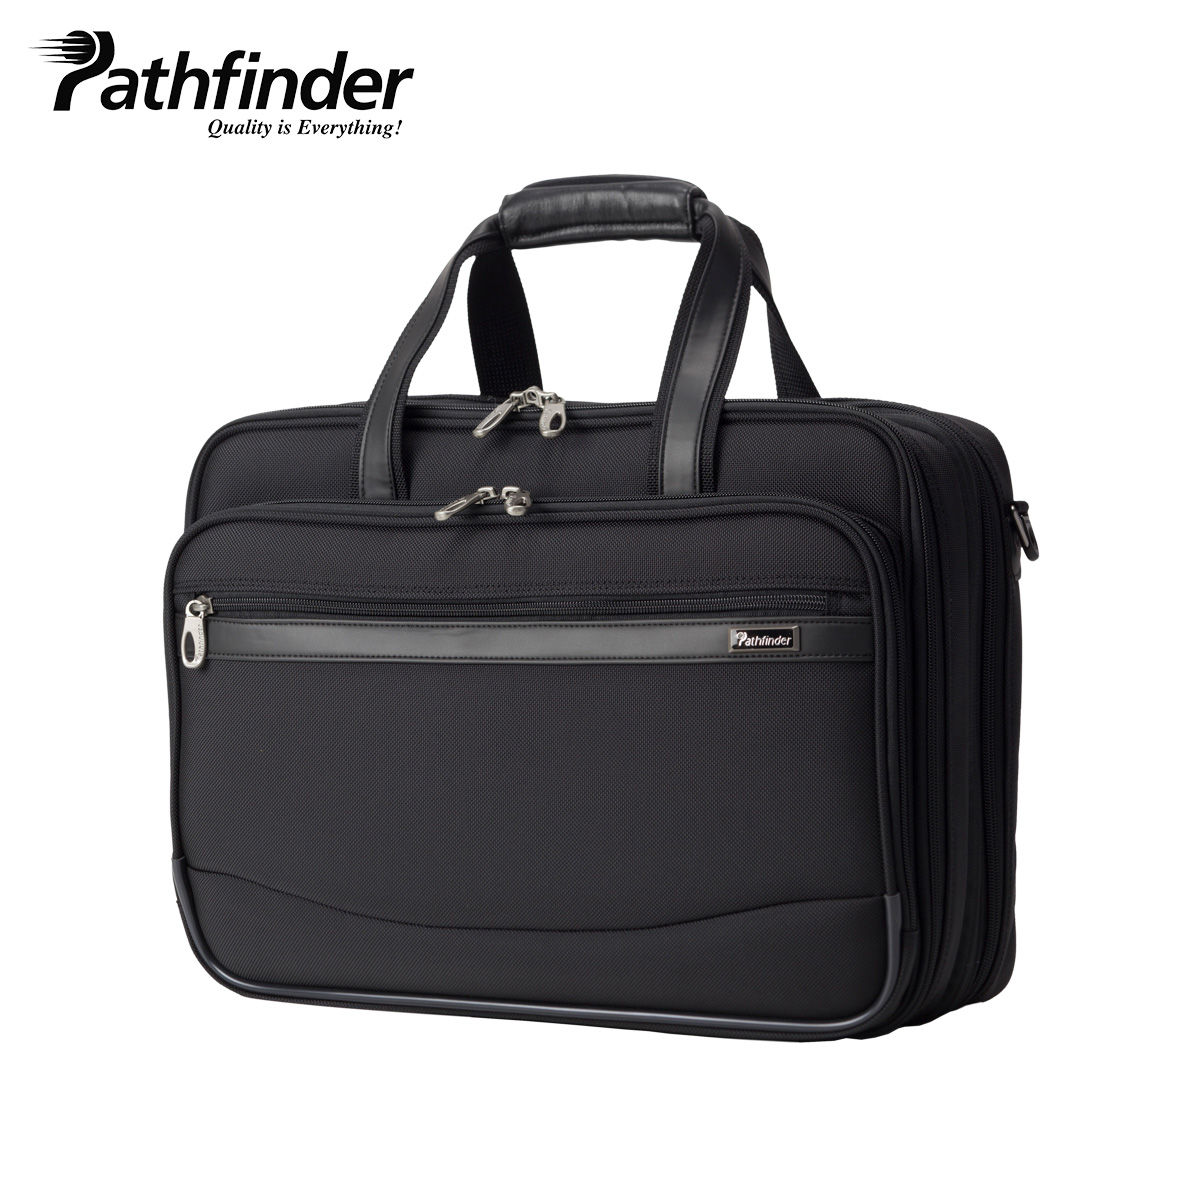 Pathfinder REVOLUTION XT パスファインダー バッグ ビジネスバッグ ブリーフケース ショルダー メンズ ブラック 黒 PF6807B